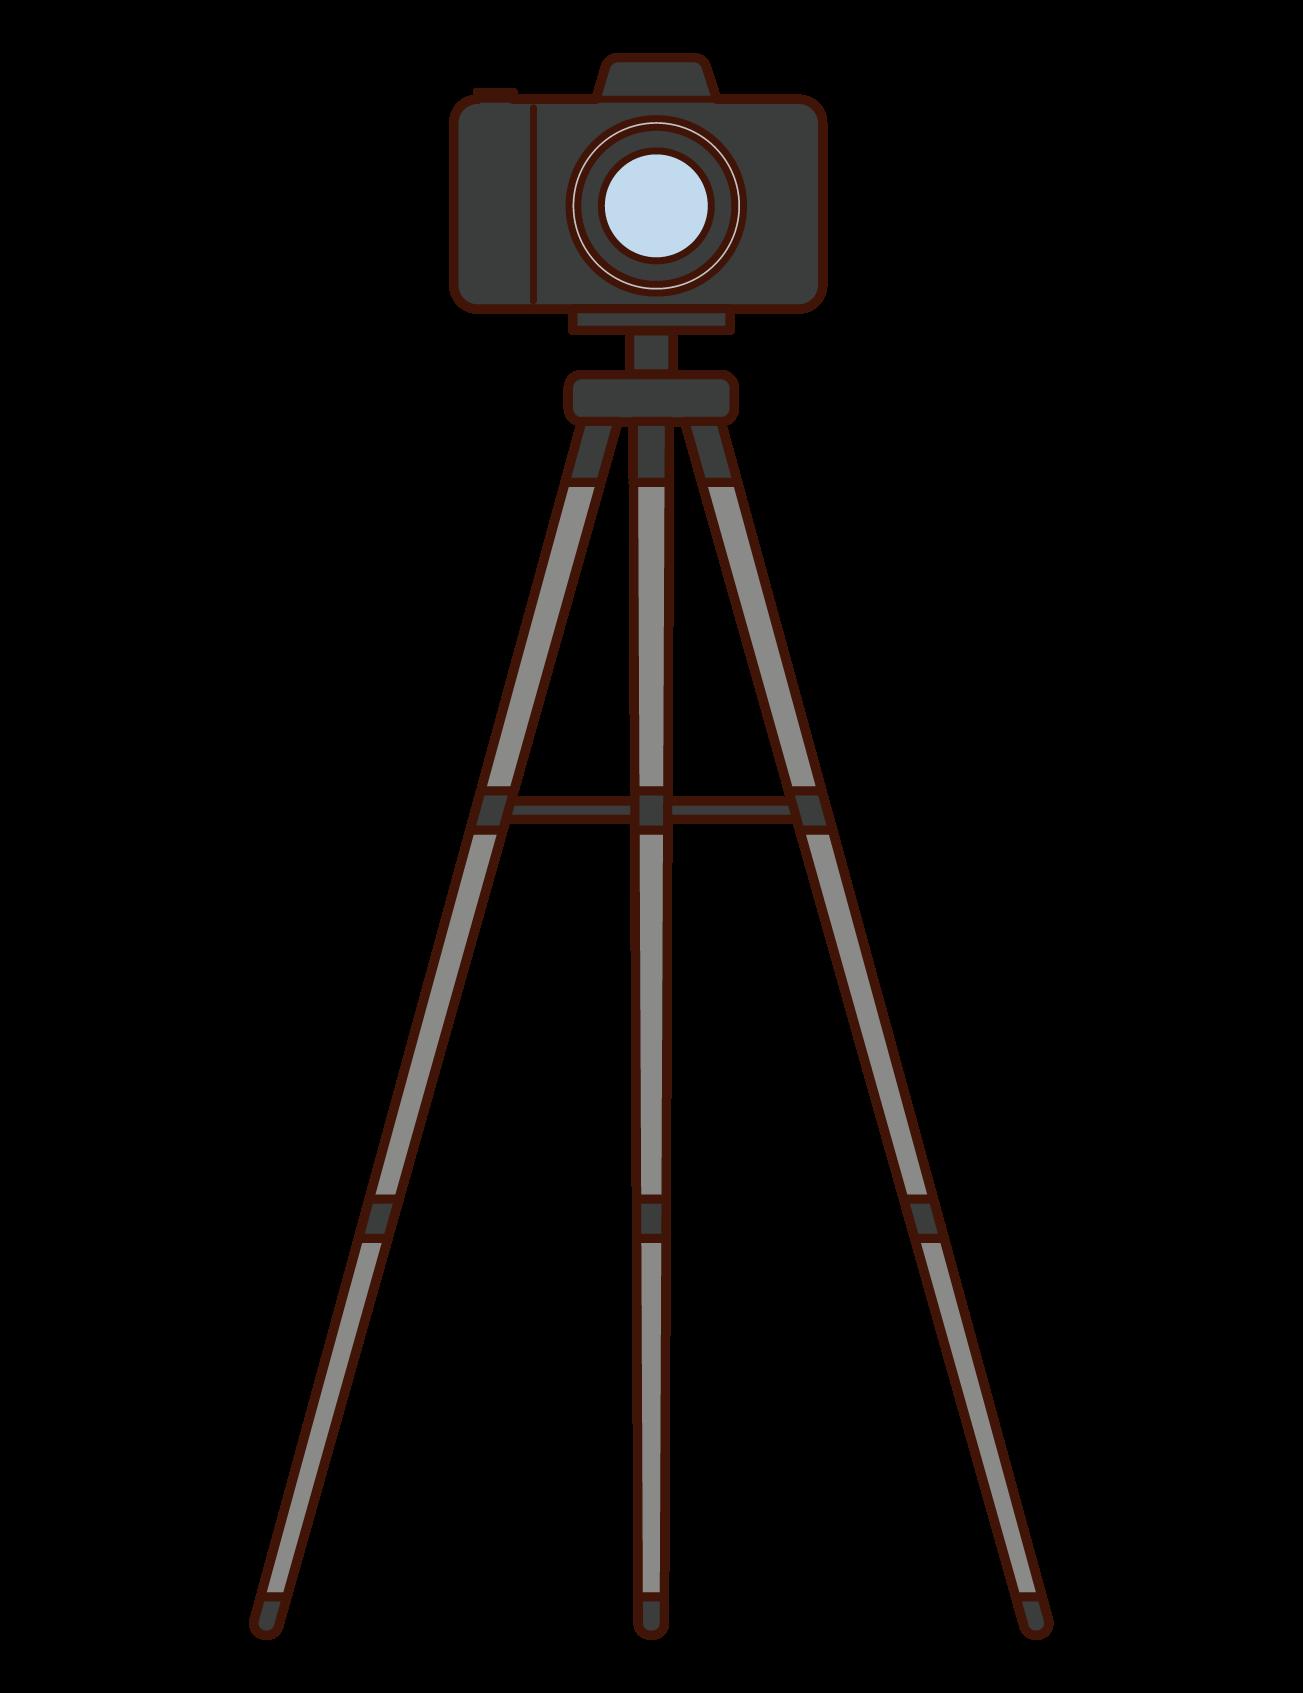 Tripod and camera illustrations